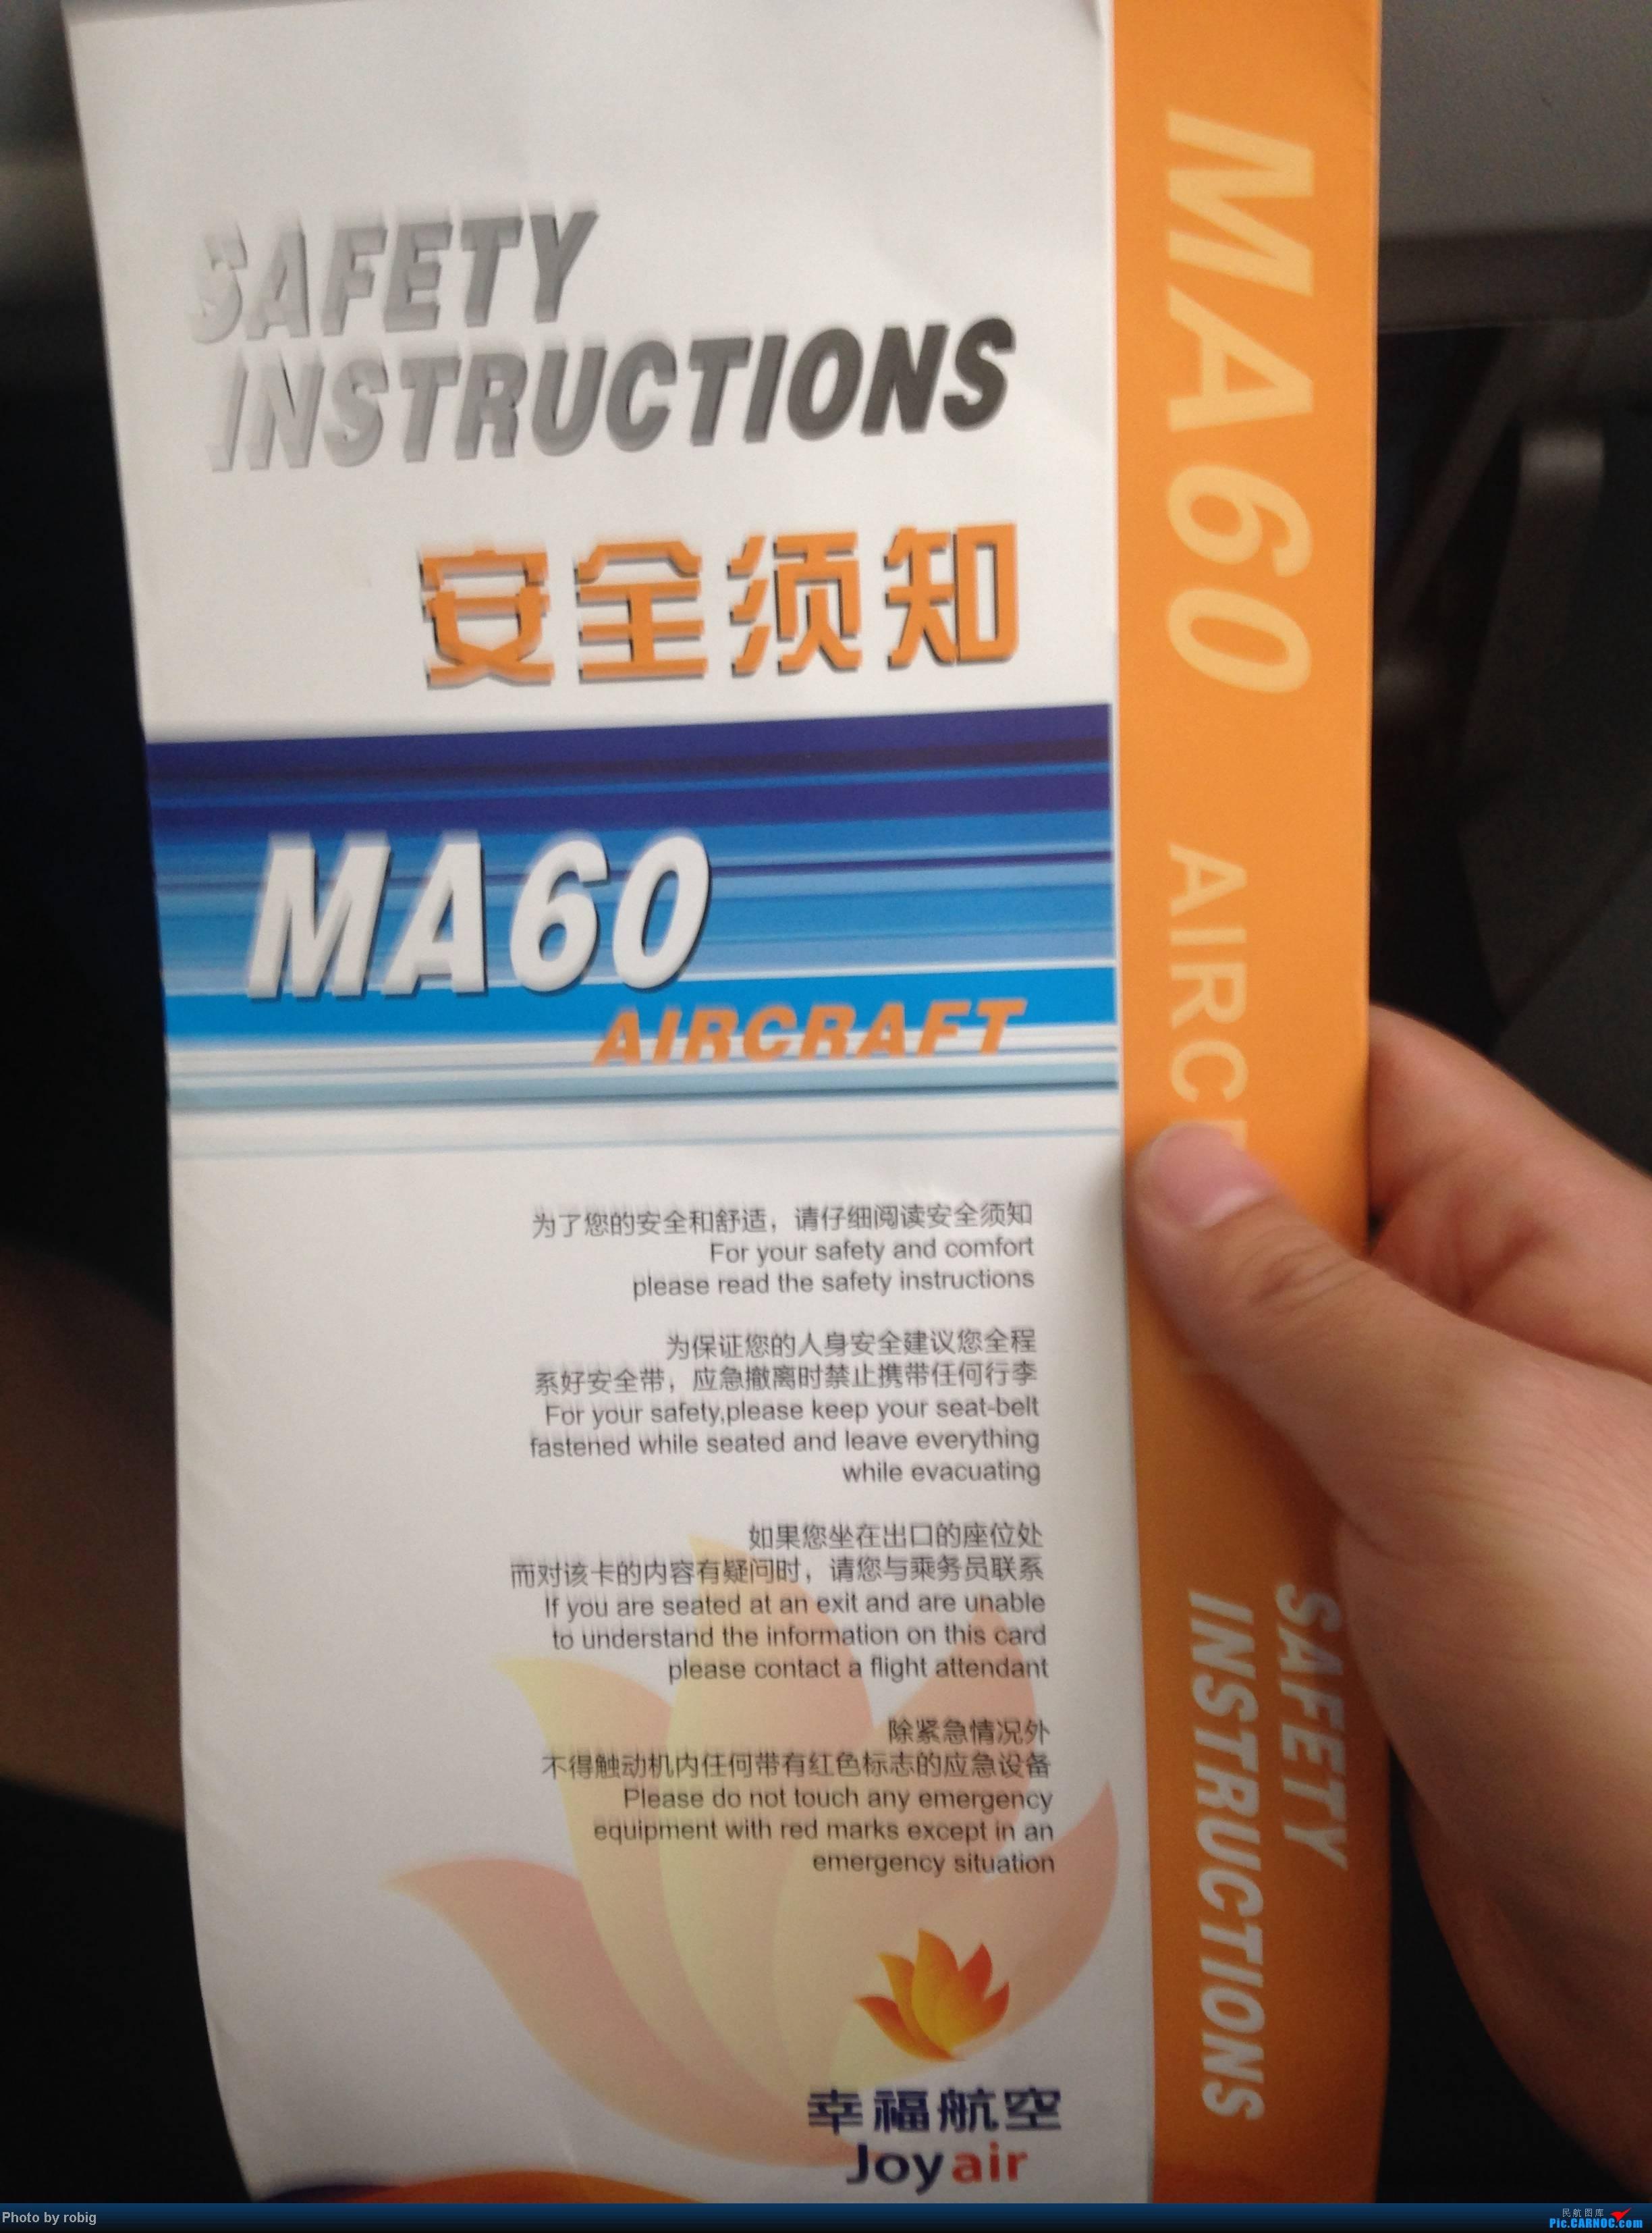 Re:[原创]XIY-GYU-ING-GYU-XIY XIFEI MA-60 B-3459 中国西安咸阳机场